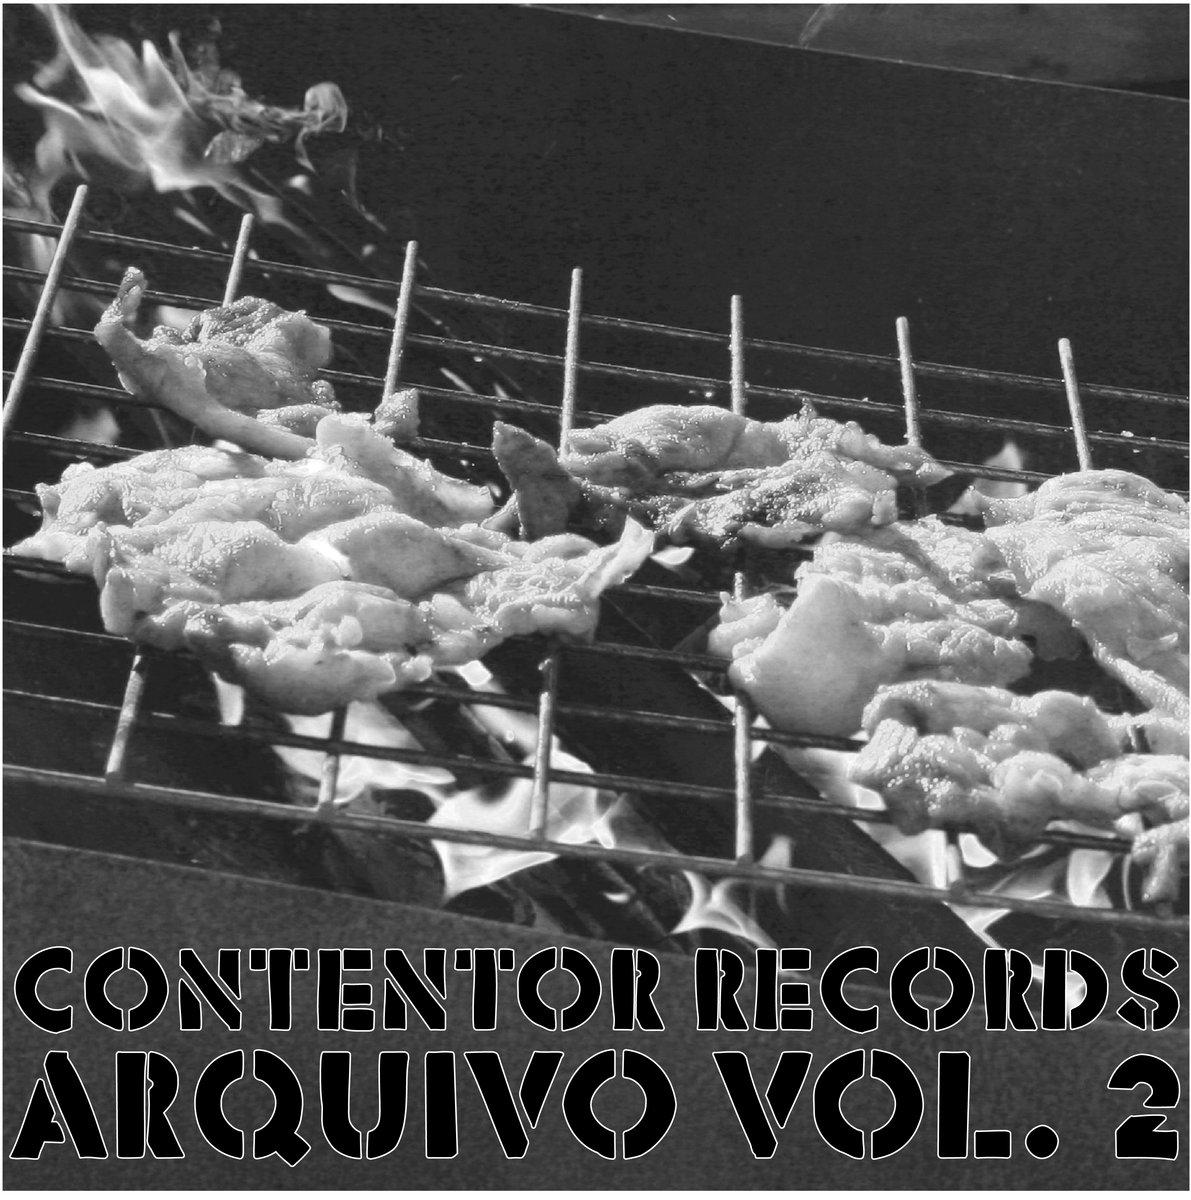 Arquivo Vol.20   Contentor Records